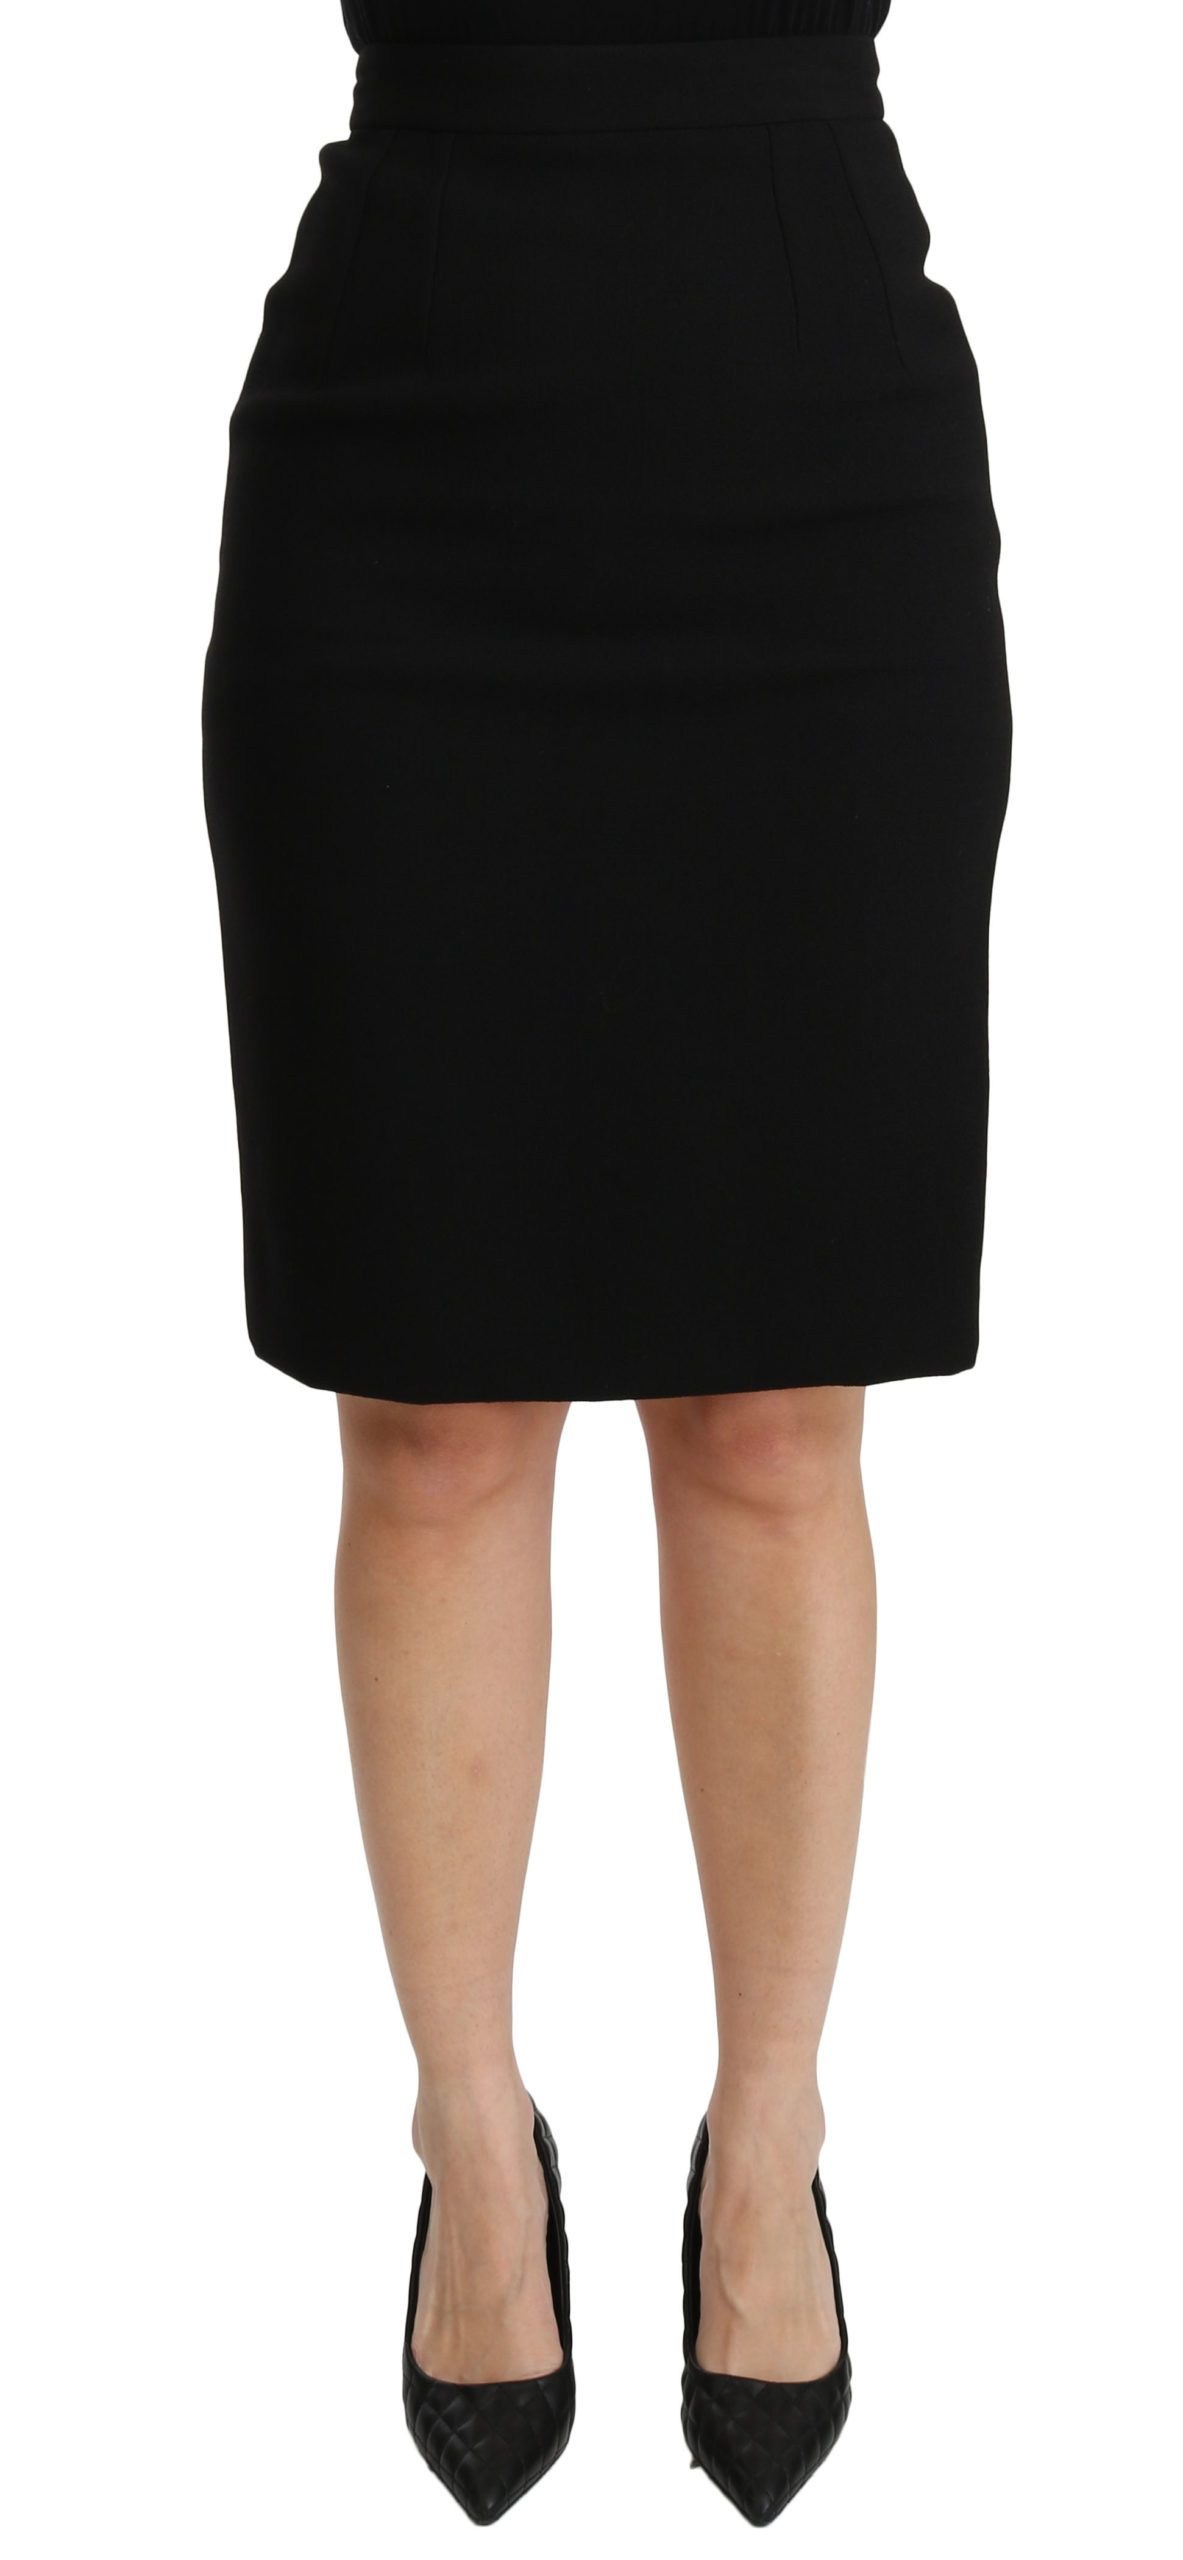 Dolce & Gabbana Women's A-line High Waist Mini Skirt Black SKI1382 - IT40 S